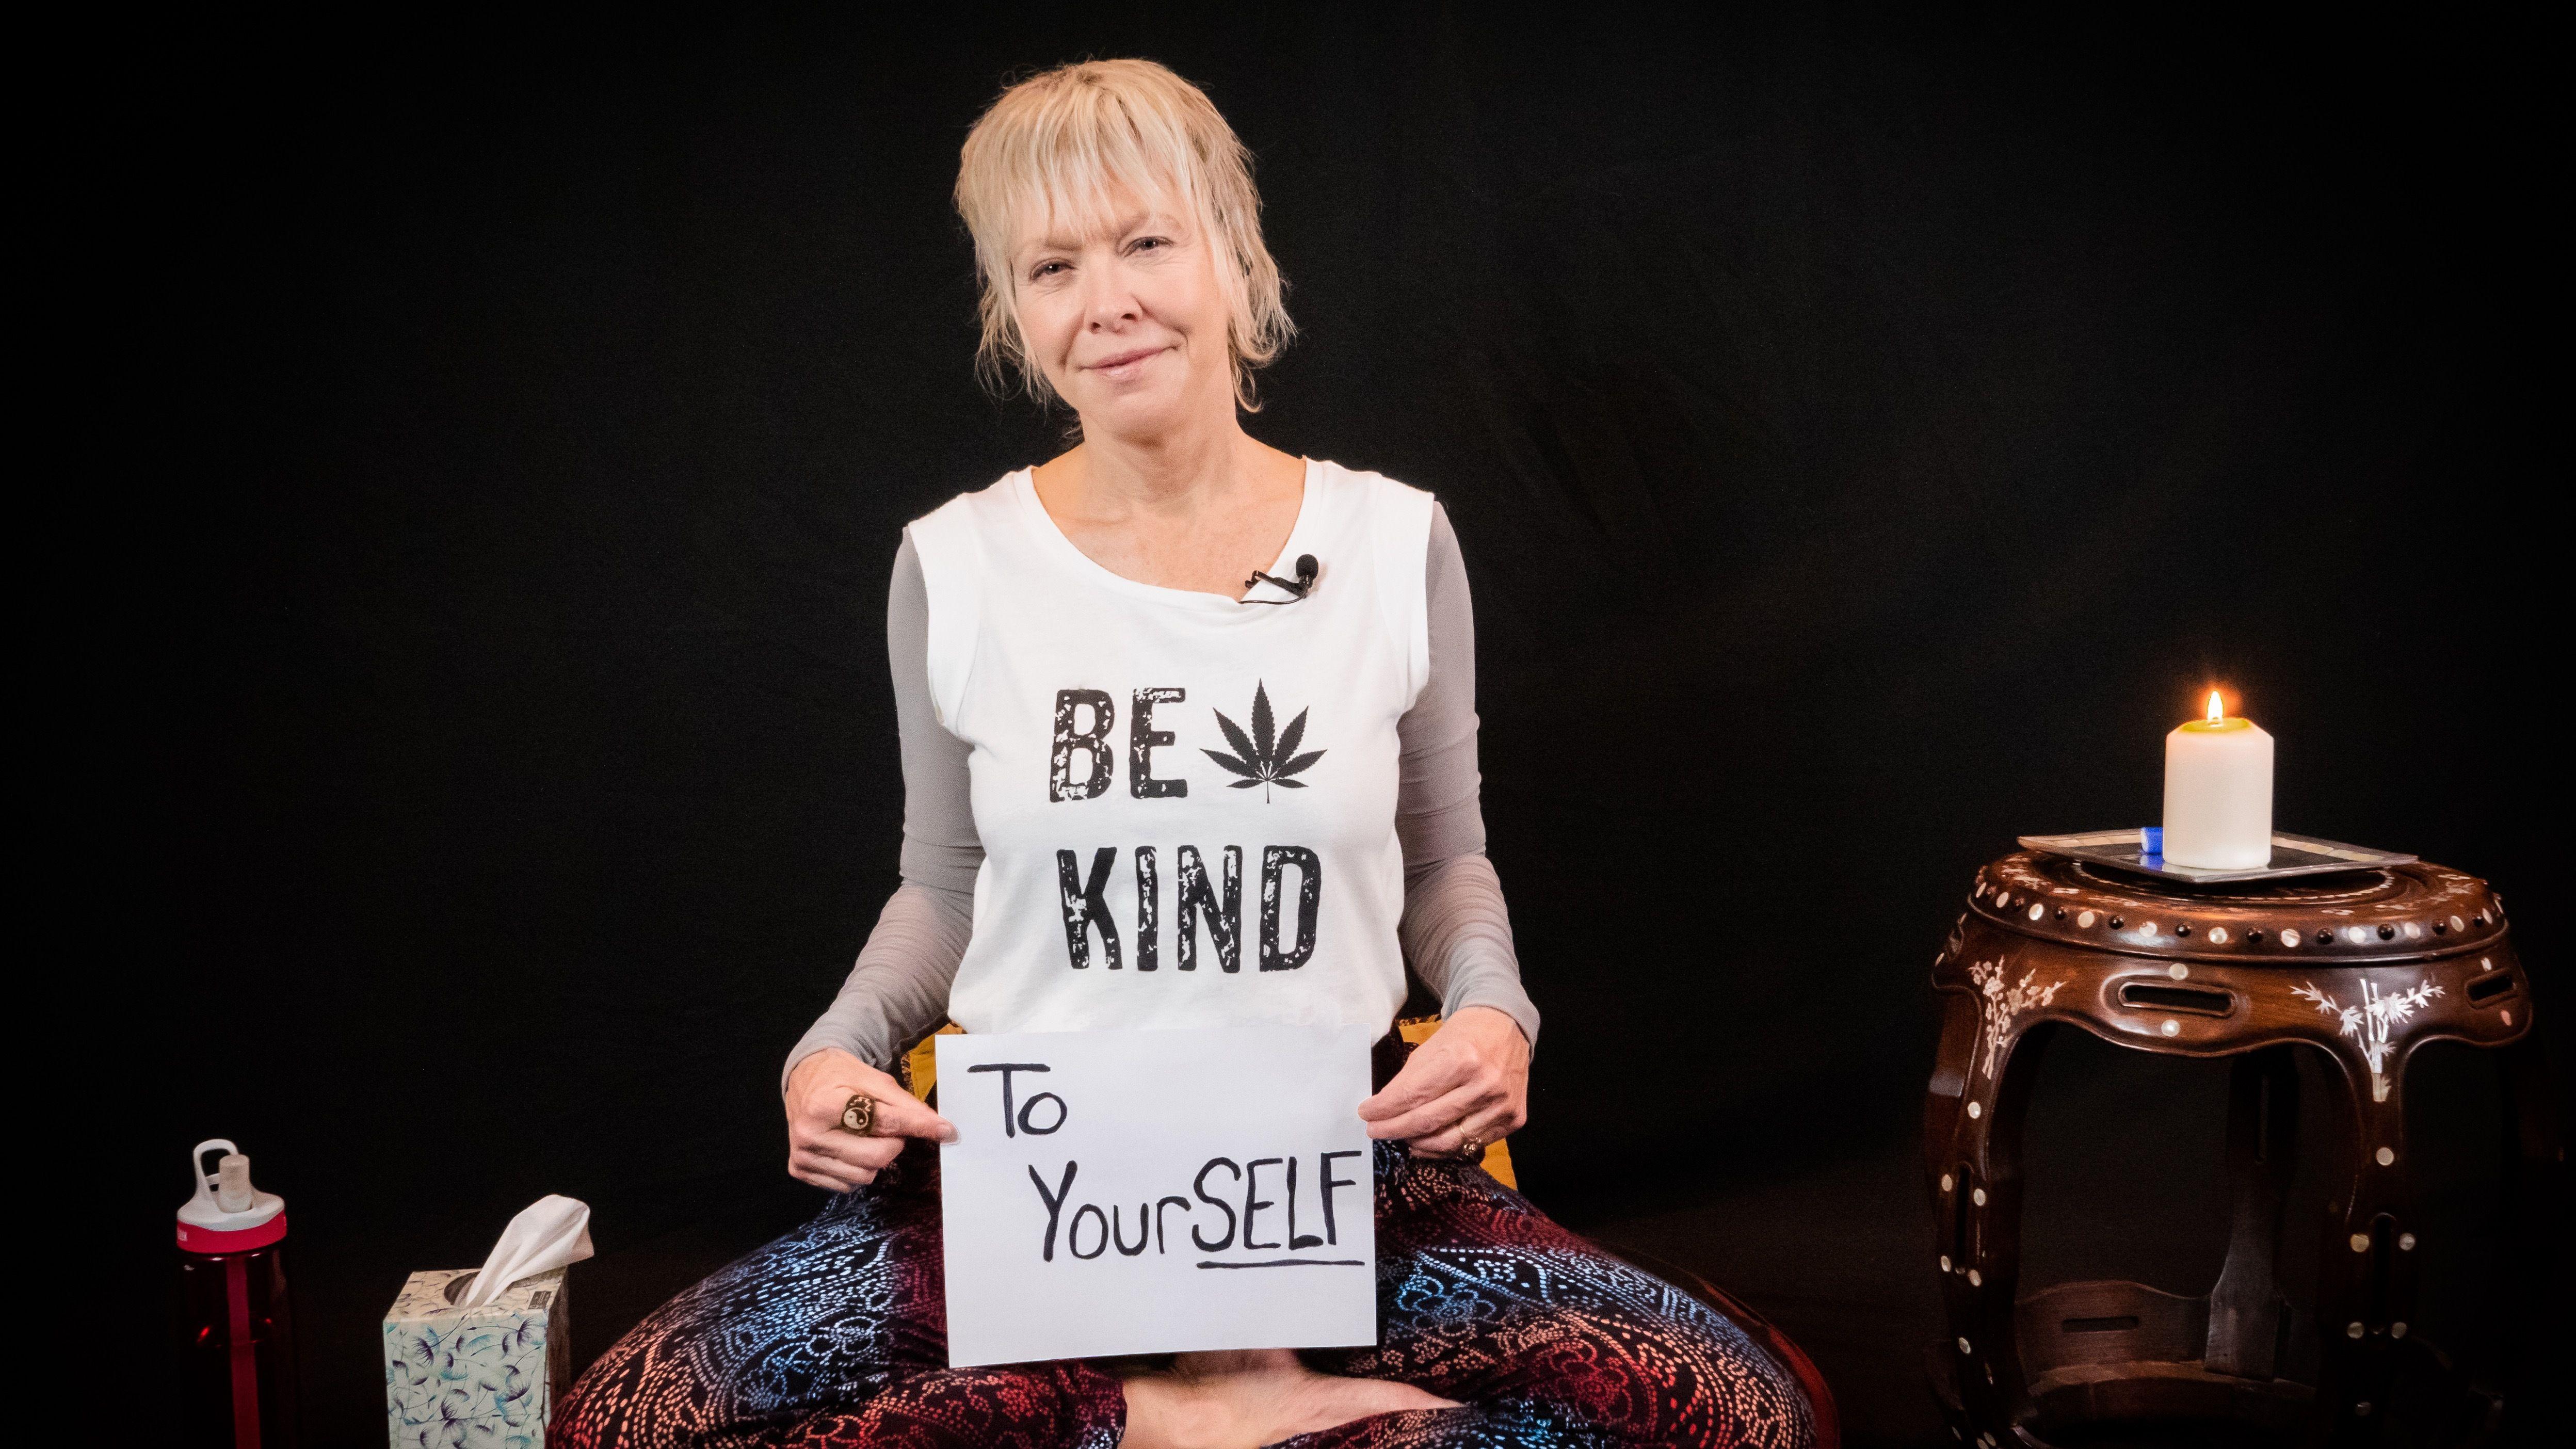 Elevation (Cannabis) Ceremonies & Meditation